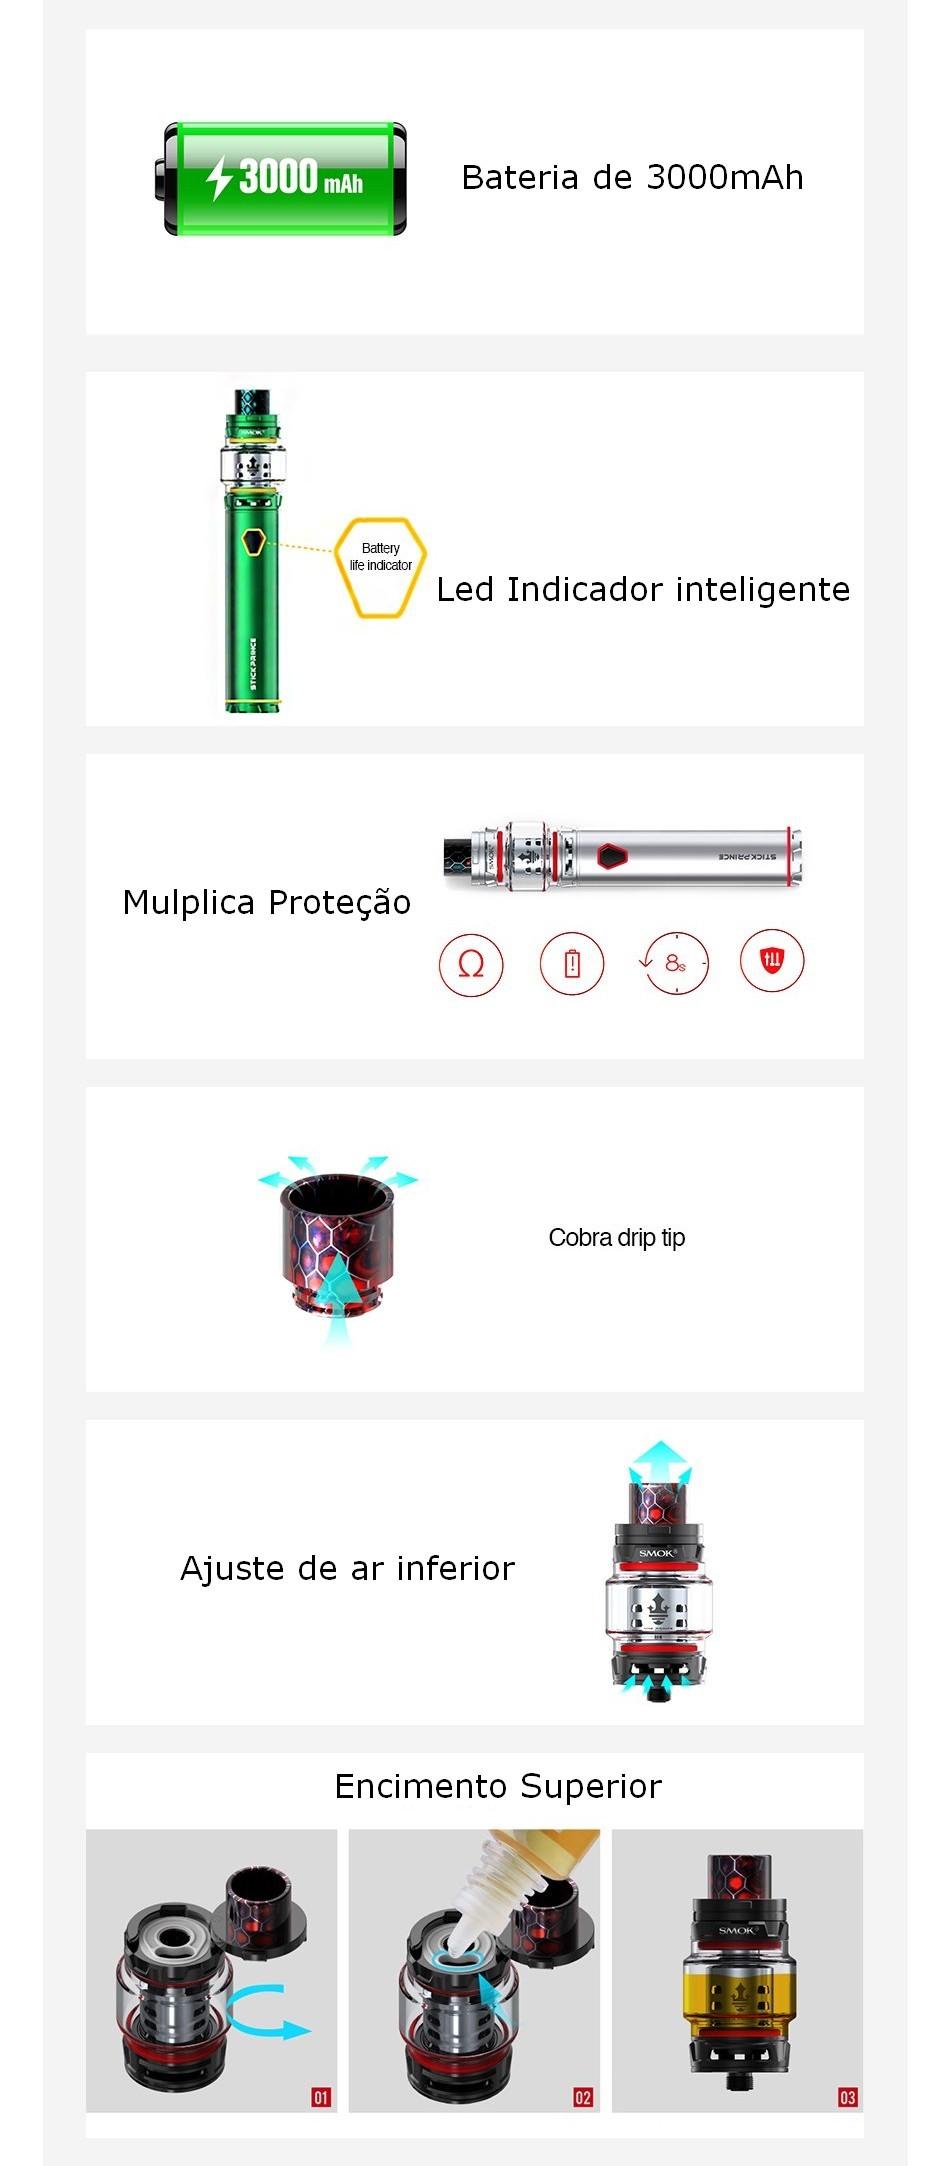 Kit Cigarro Eletrônico Stick Prince características